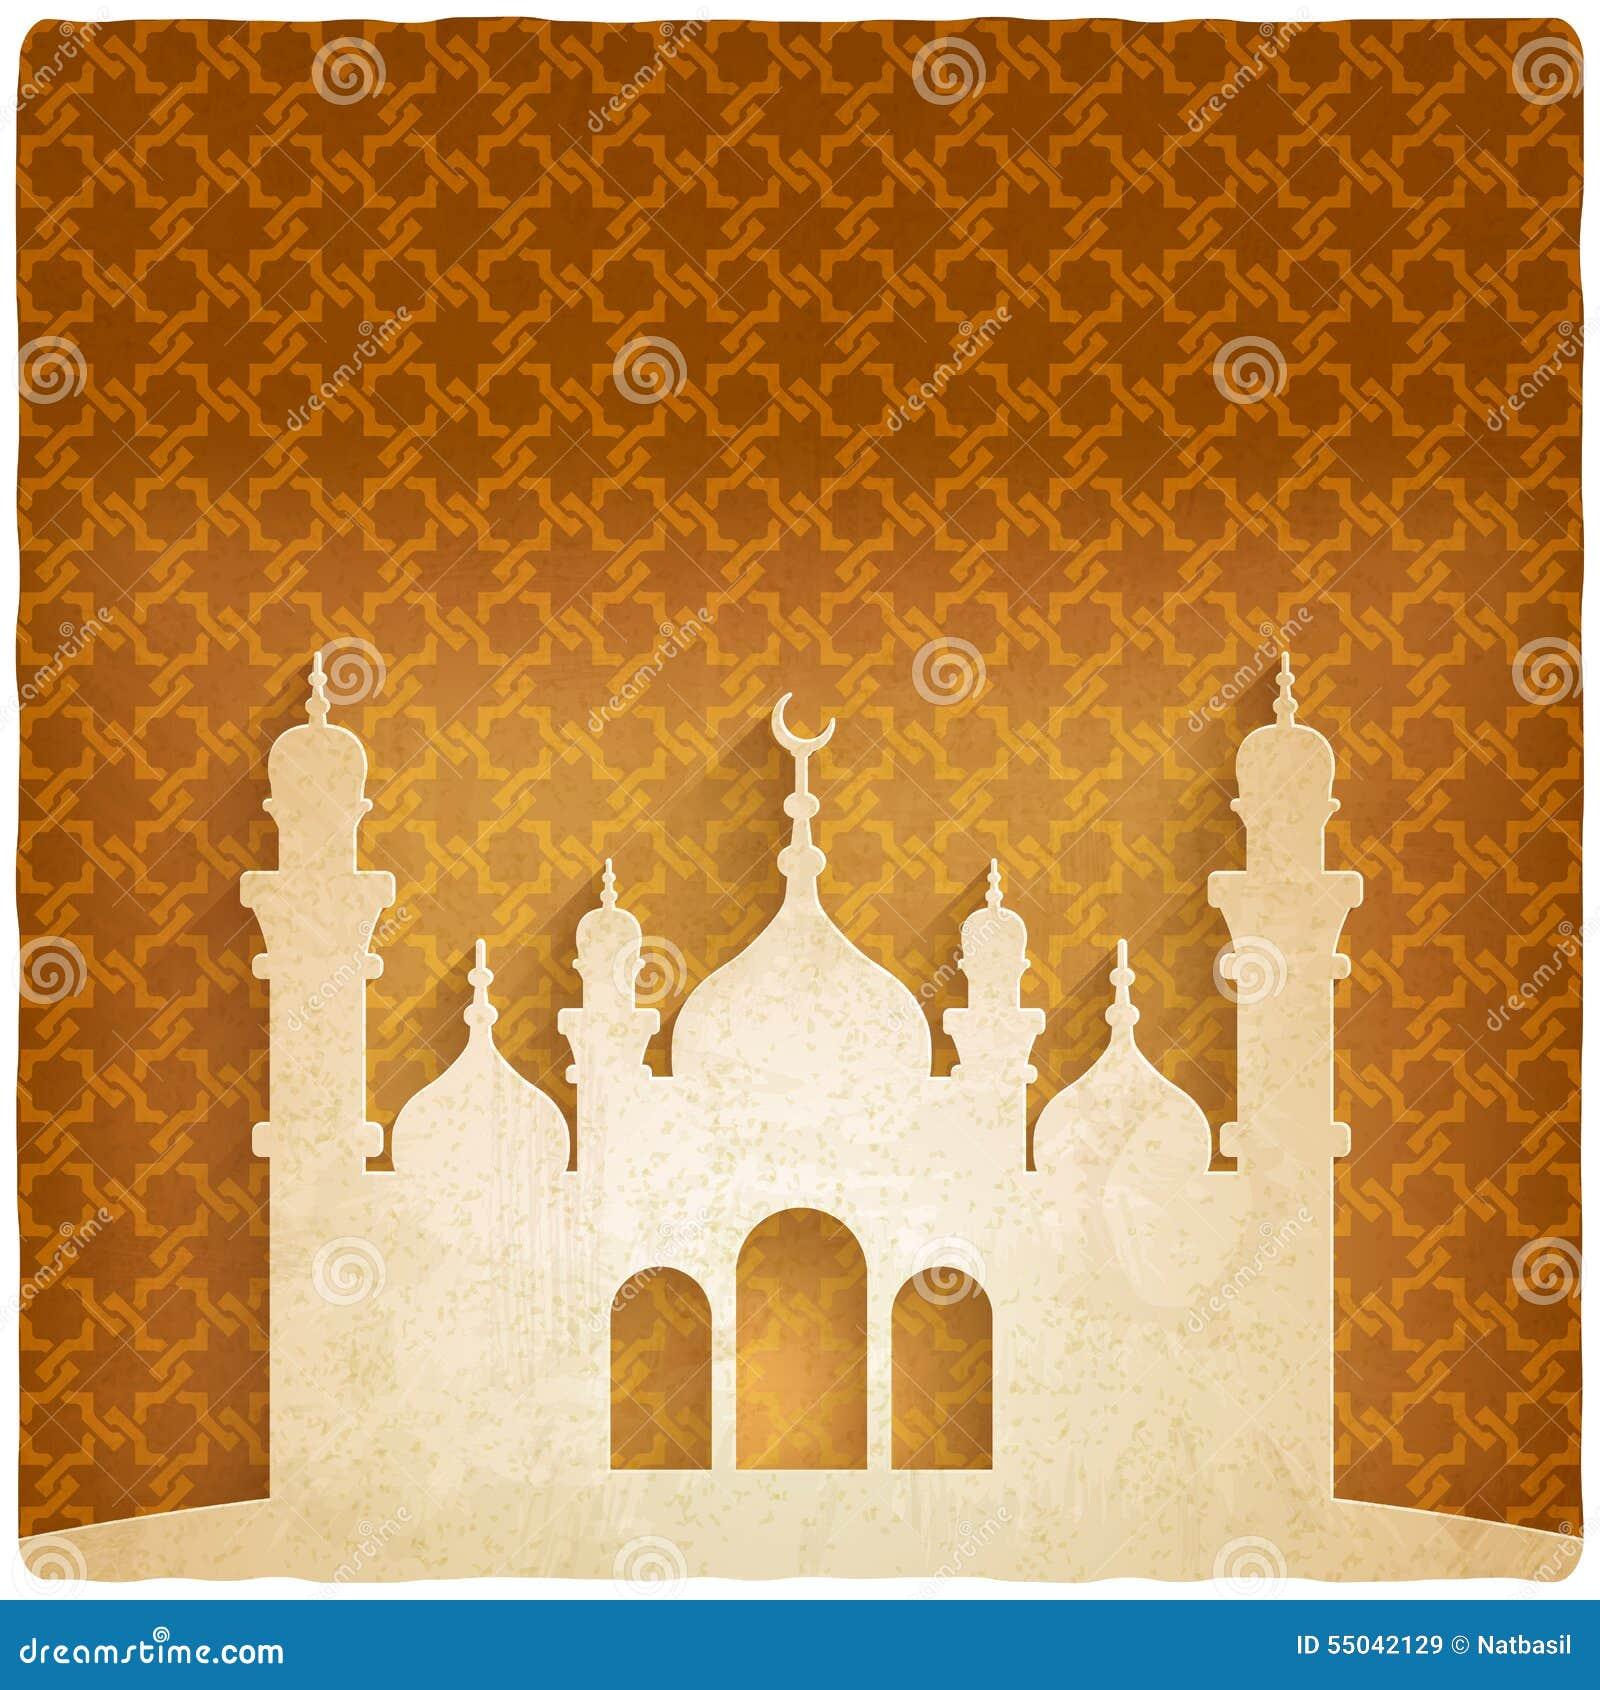 Mosque background for ramadan kareem stock photography image - Background Illustration Islamic Kareem Mosque Ramadan